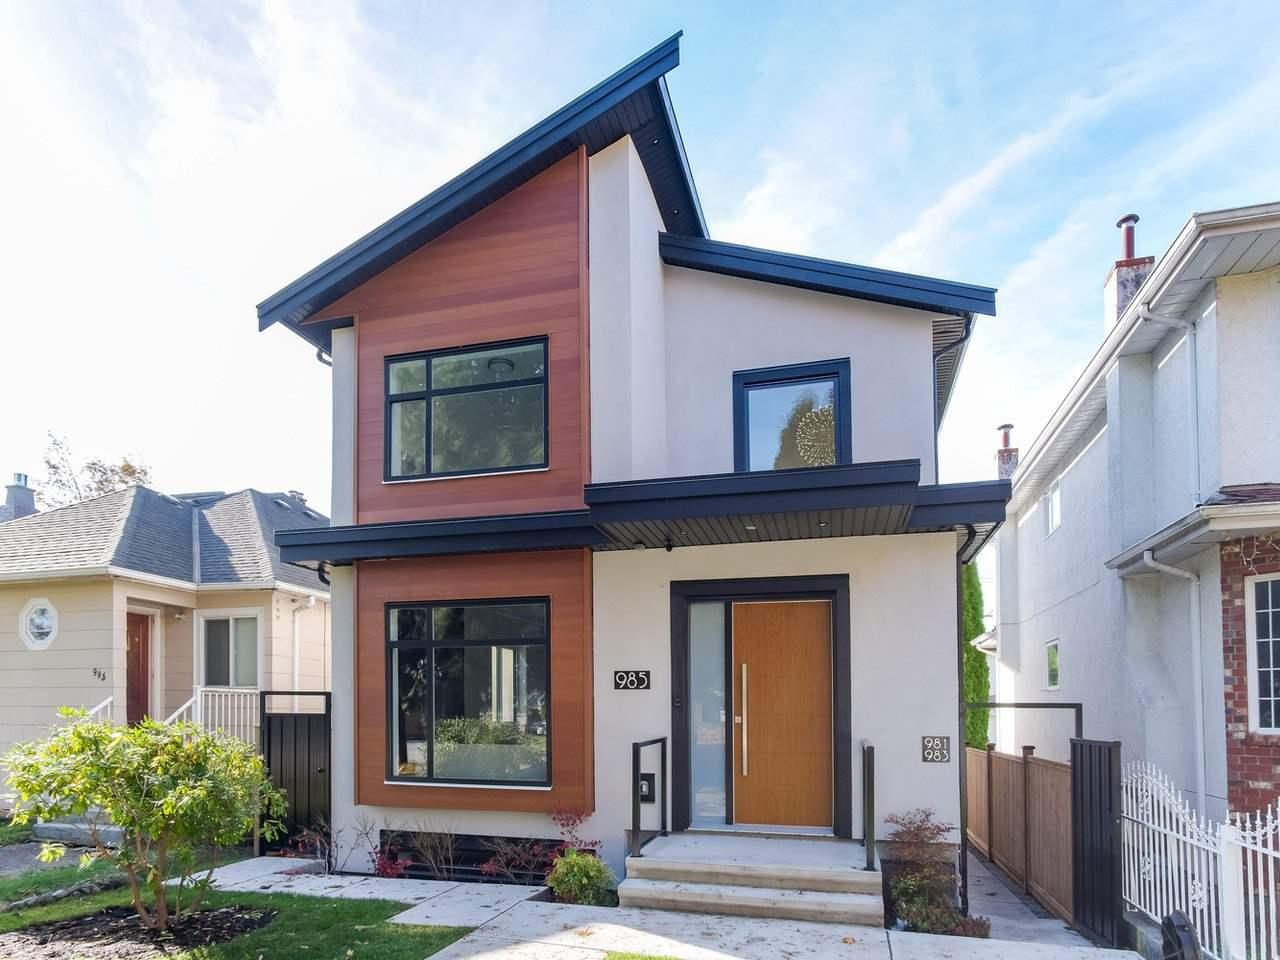 985 LILLOOET STREET - MLS® # R2415268